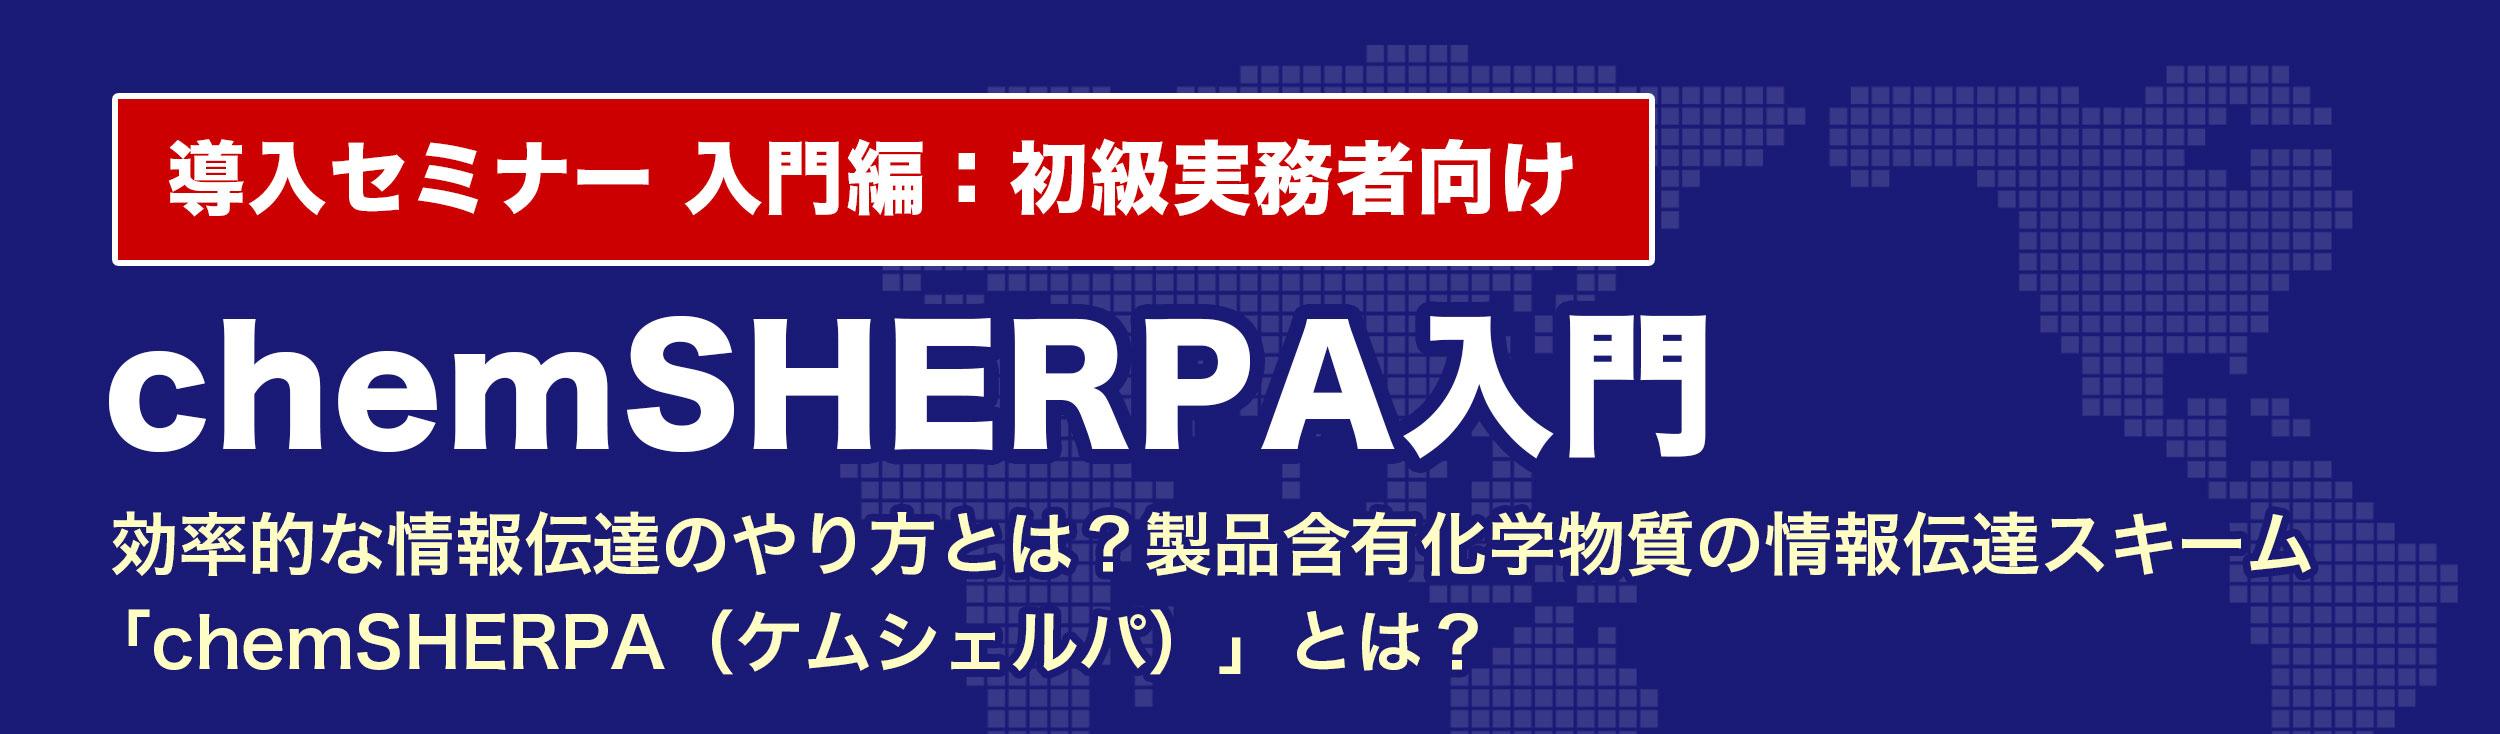 chemSHERPA(ケムシェルパ)入門【初級実務者向け】効果的な情報伝達のやり方とは?新たなスキーム「chemSHERPA(ケムシェルパ)」とは?